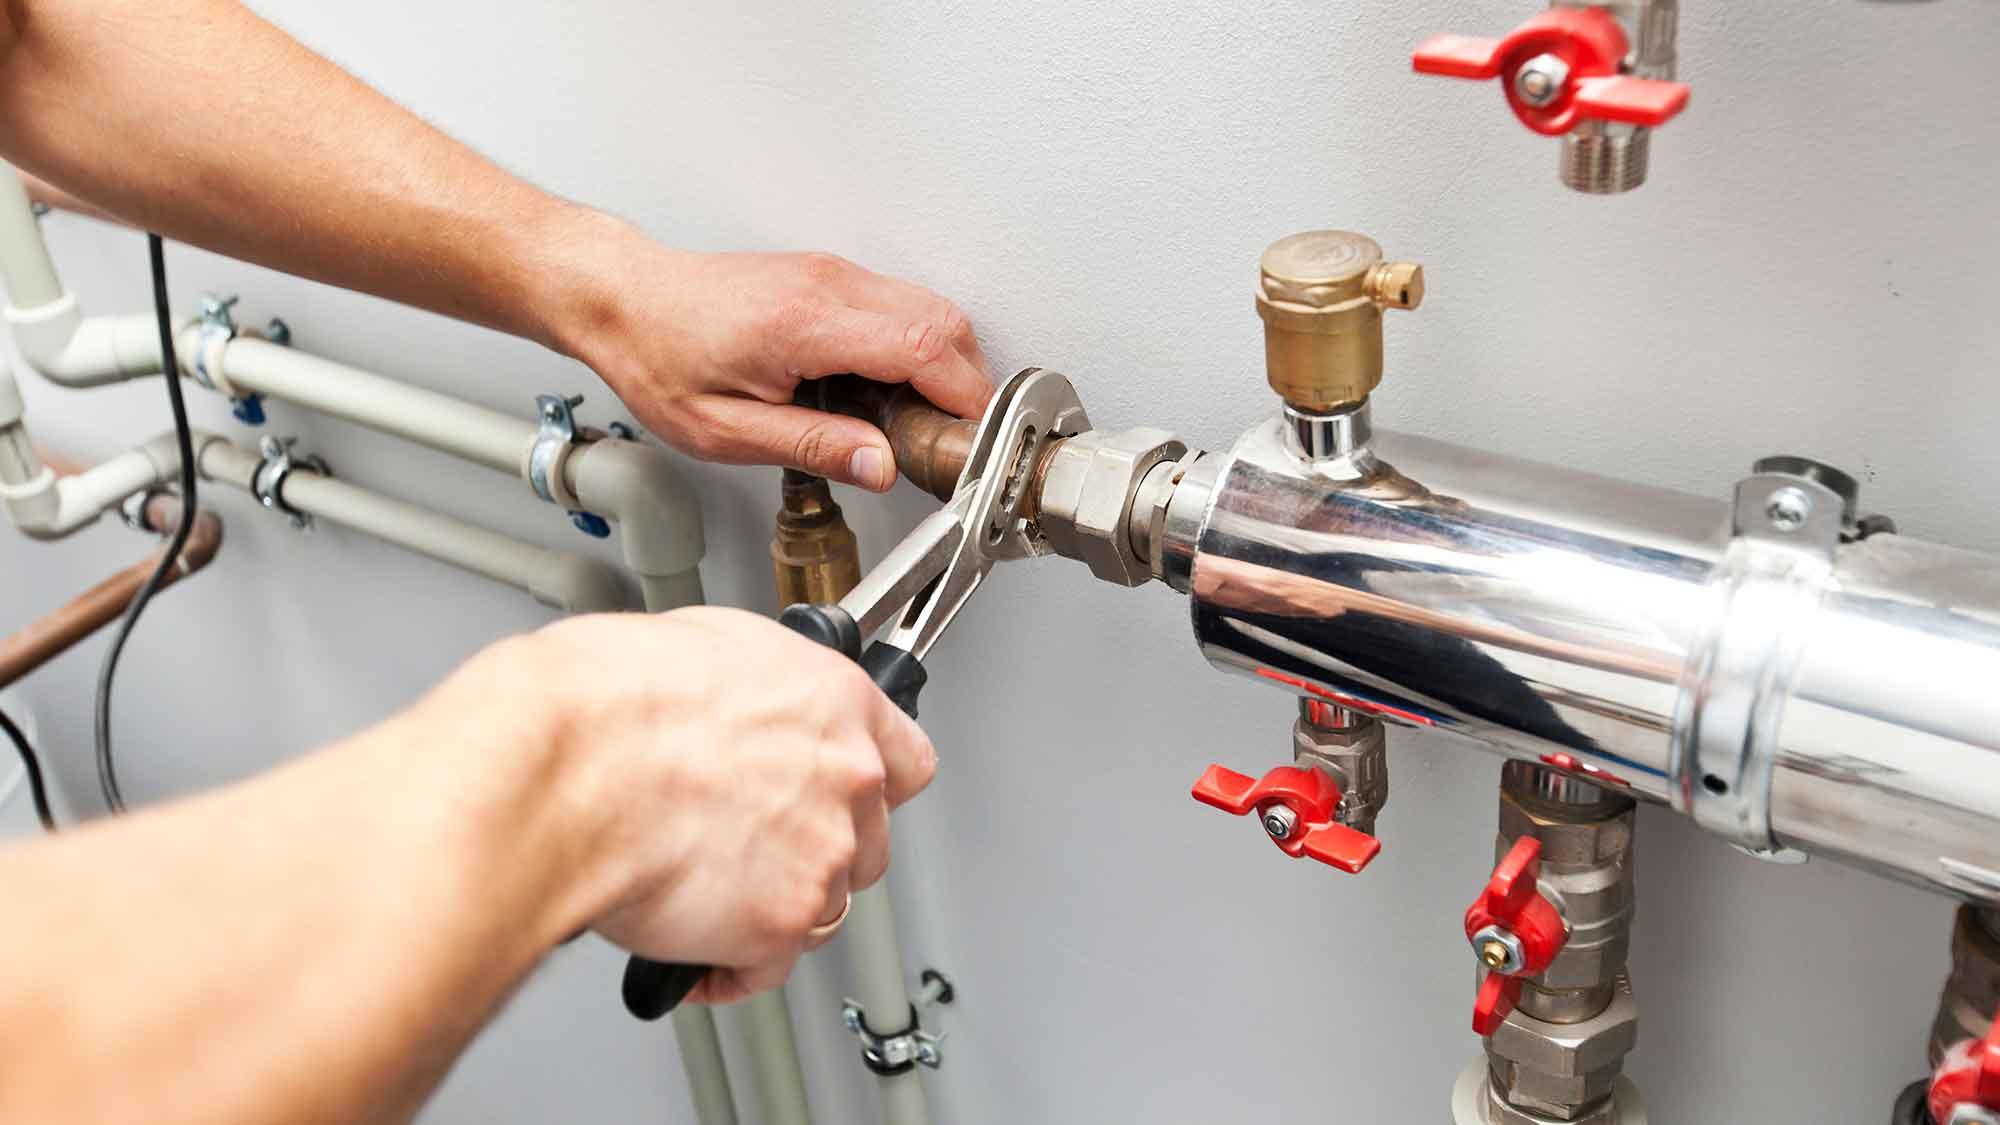 central heating installation essex maintenance leigh on sea engineer